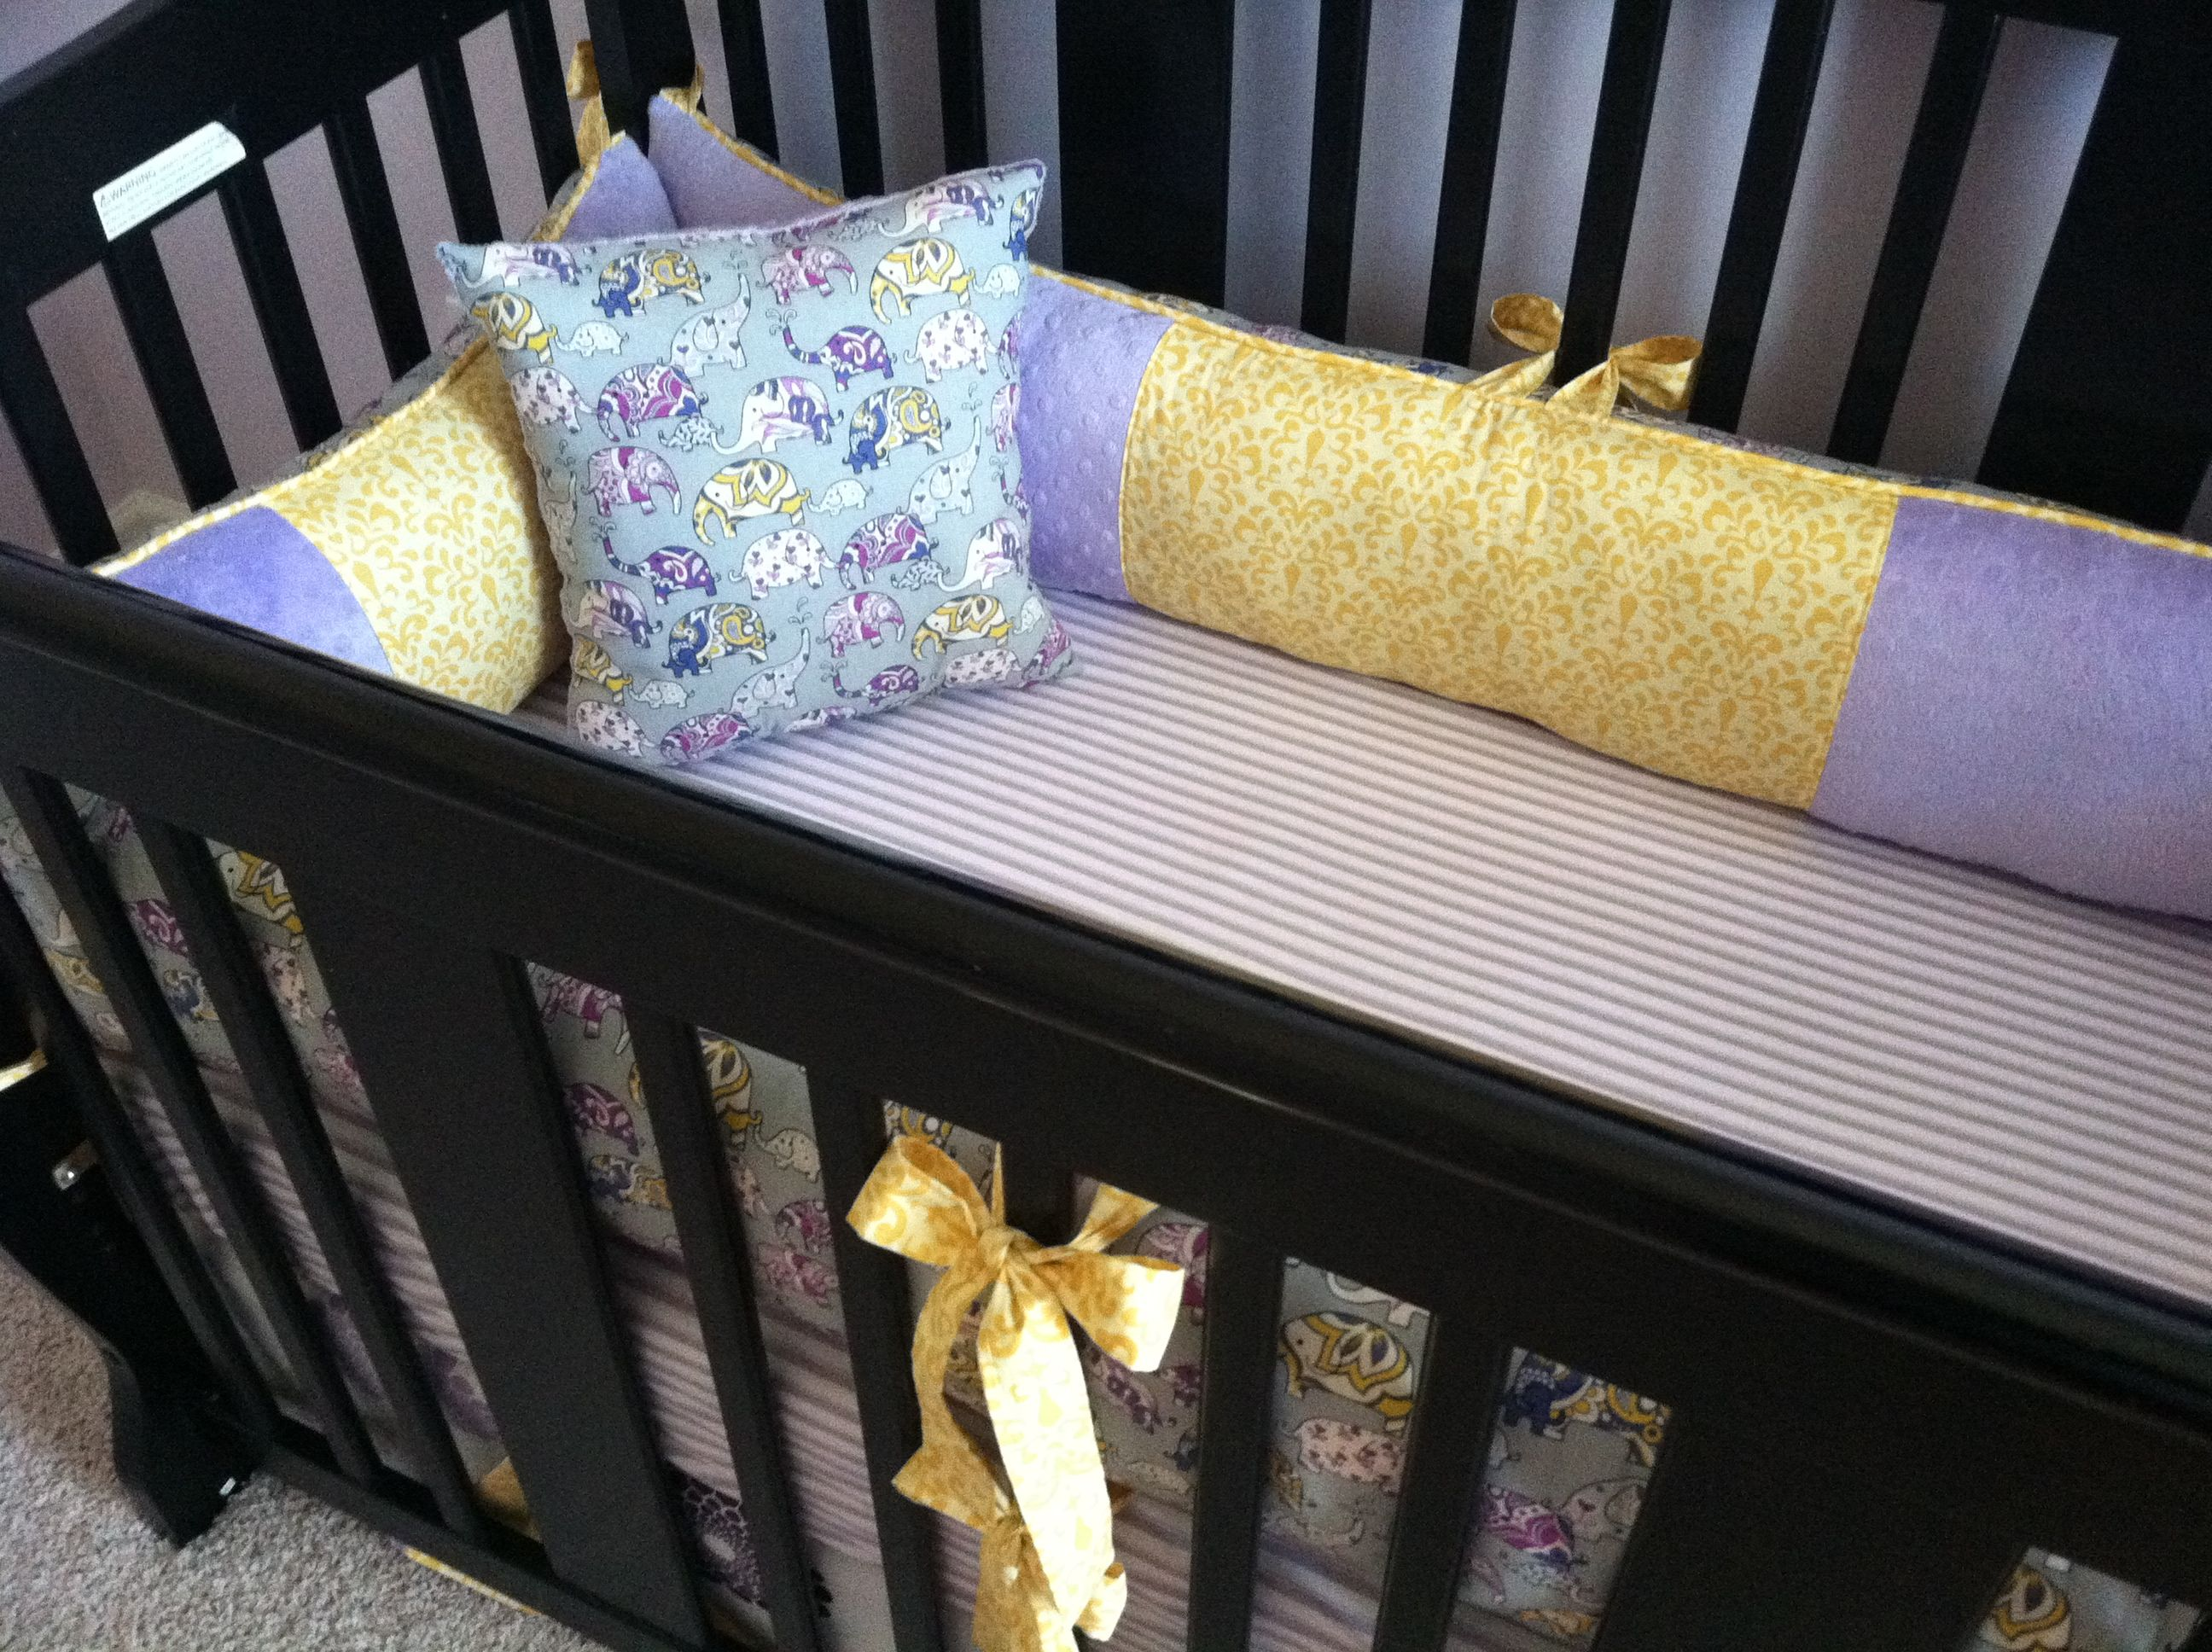 Purple elephant crib bedding custom made by Posh Petites Boutique. https://www.facebook.com/poshpetitesboutique lmb0828@hotmail.com